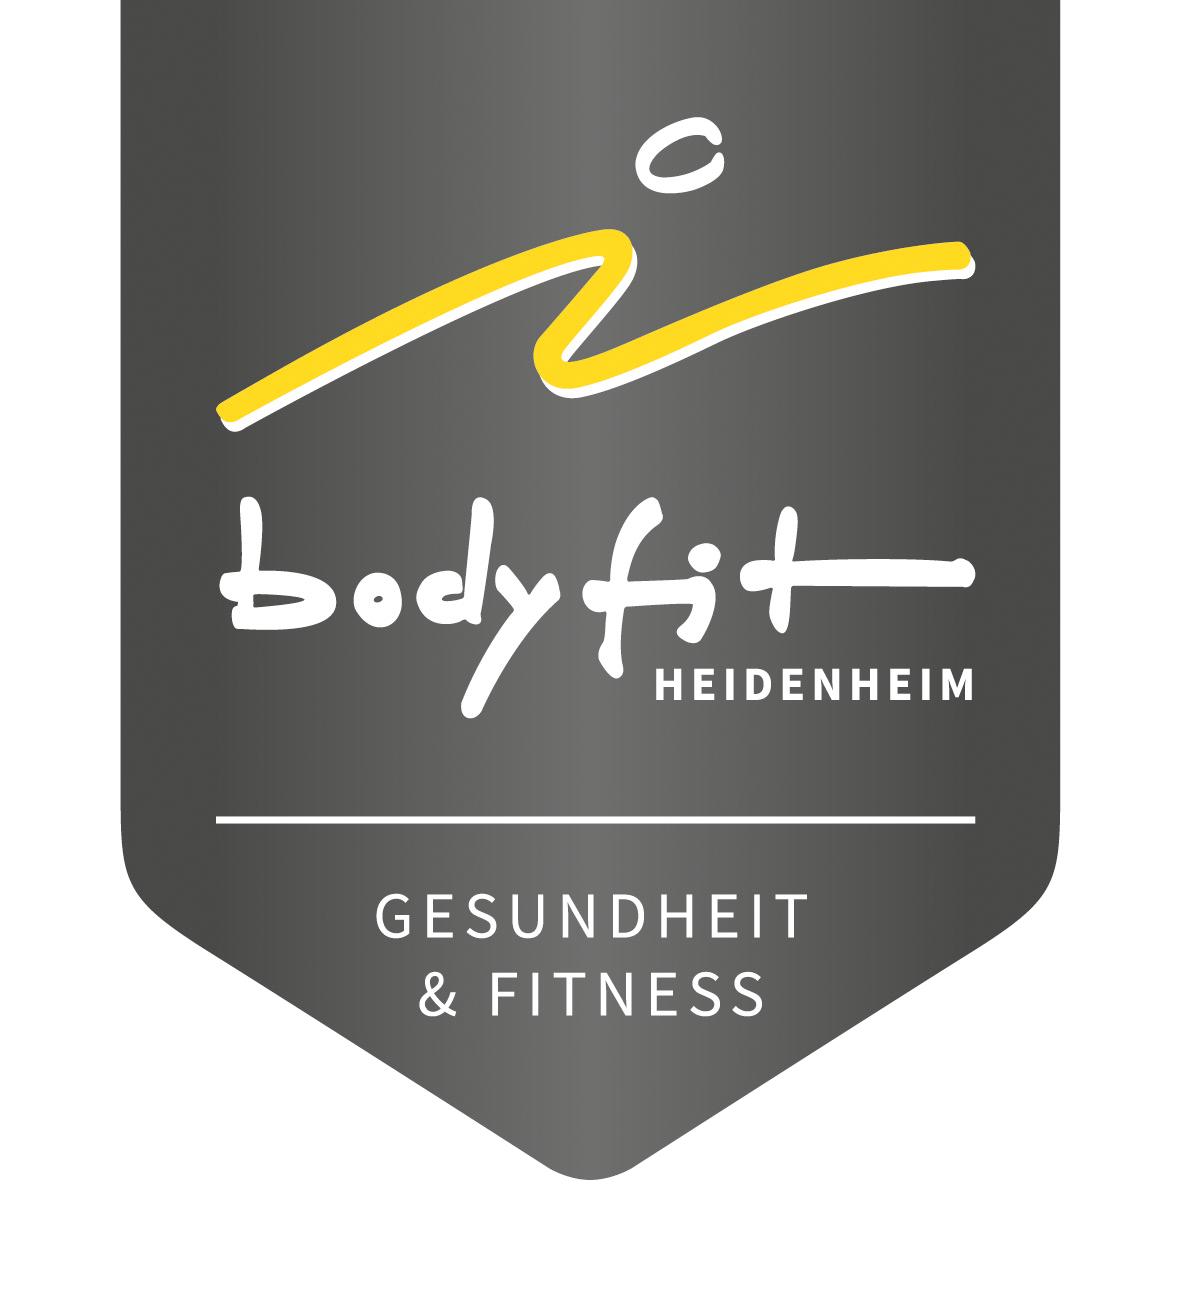 FFV Heidenheim e.V. – Sponsoren – Bodyfit